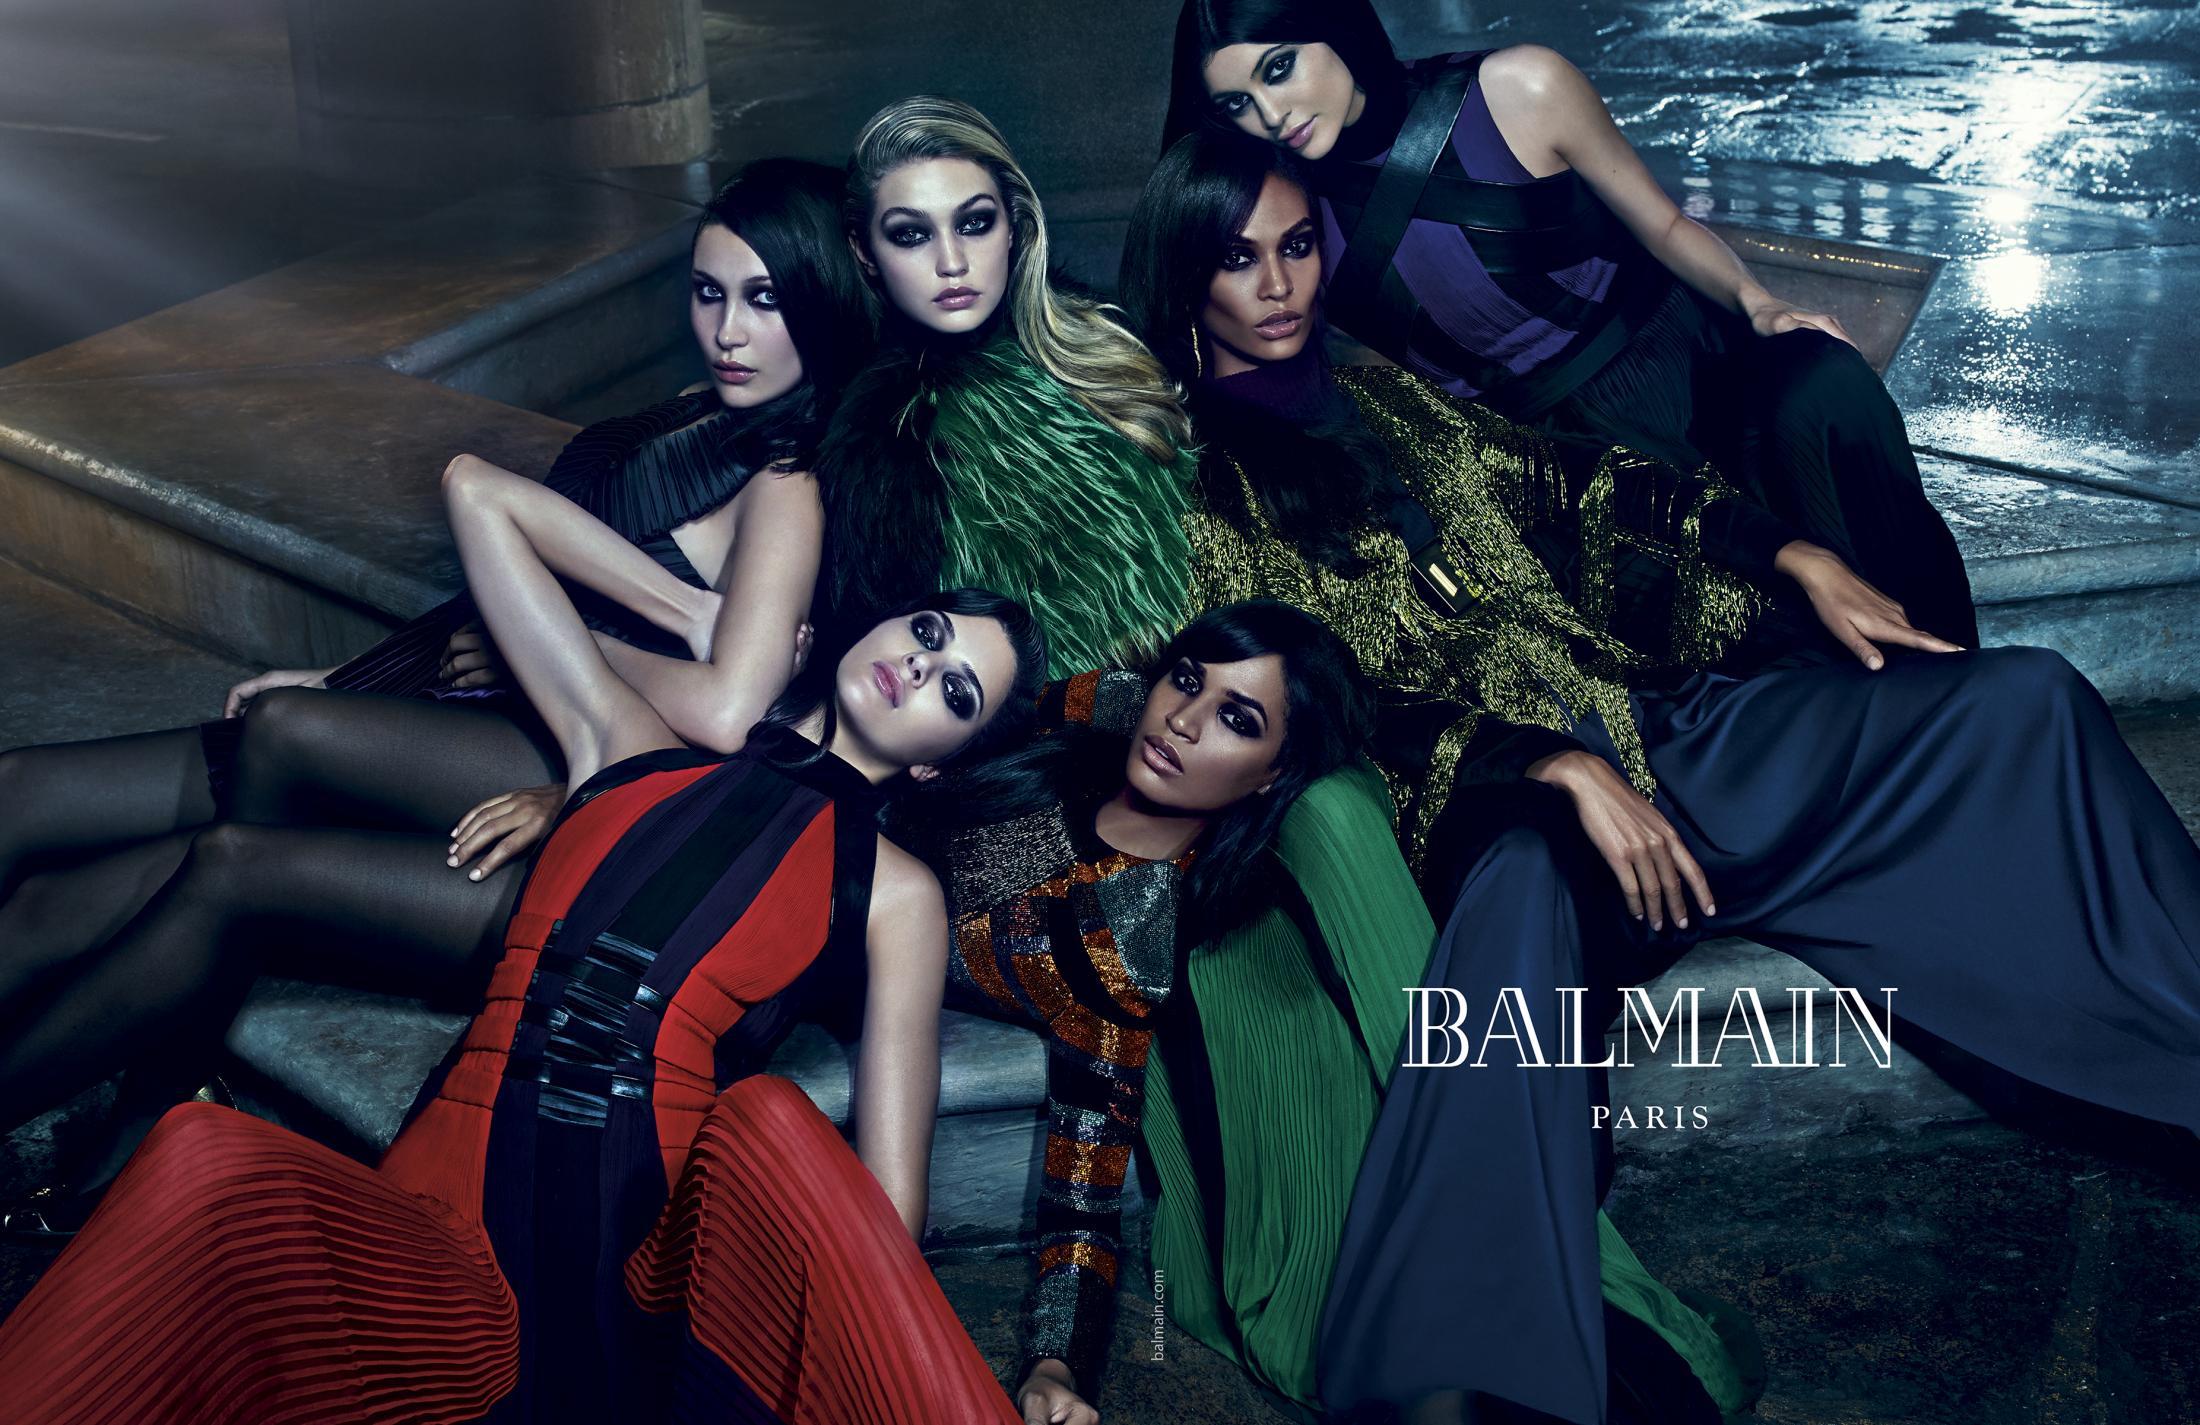 Thumbnail for Balmain Fall/Winter 2015